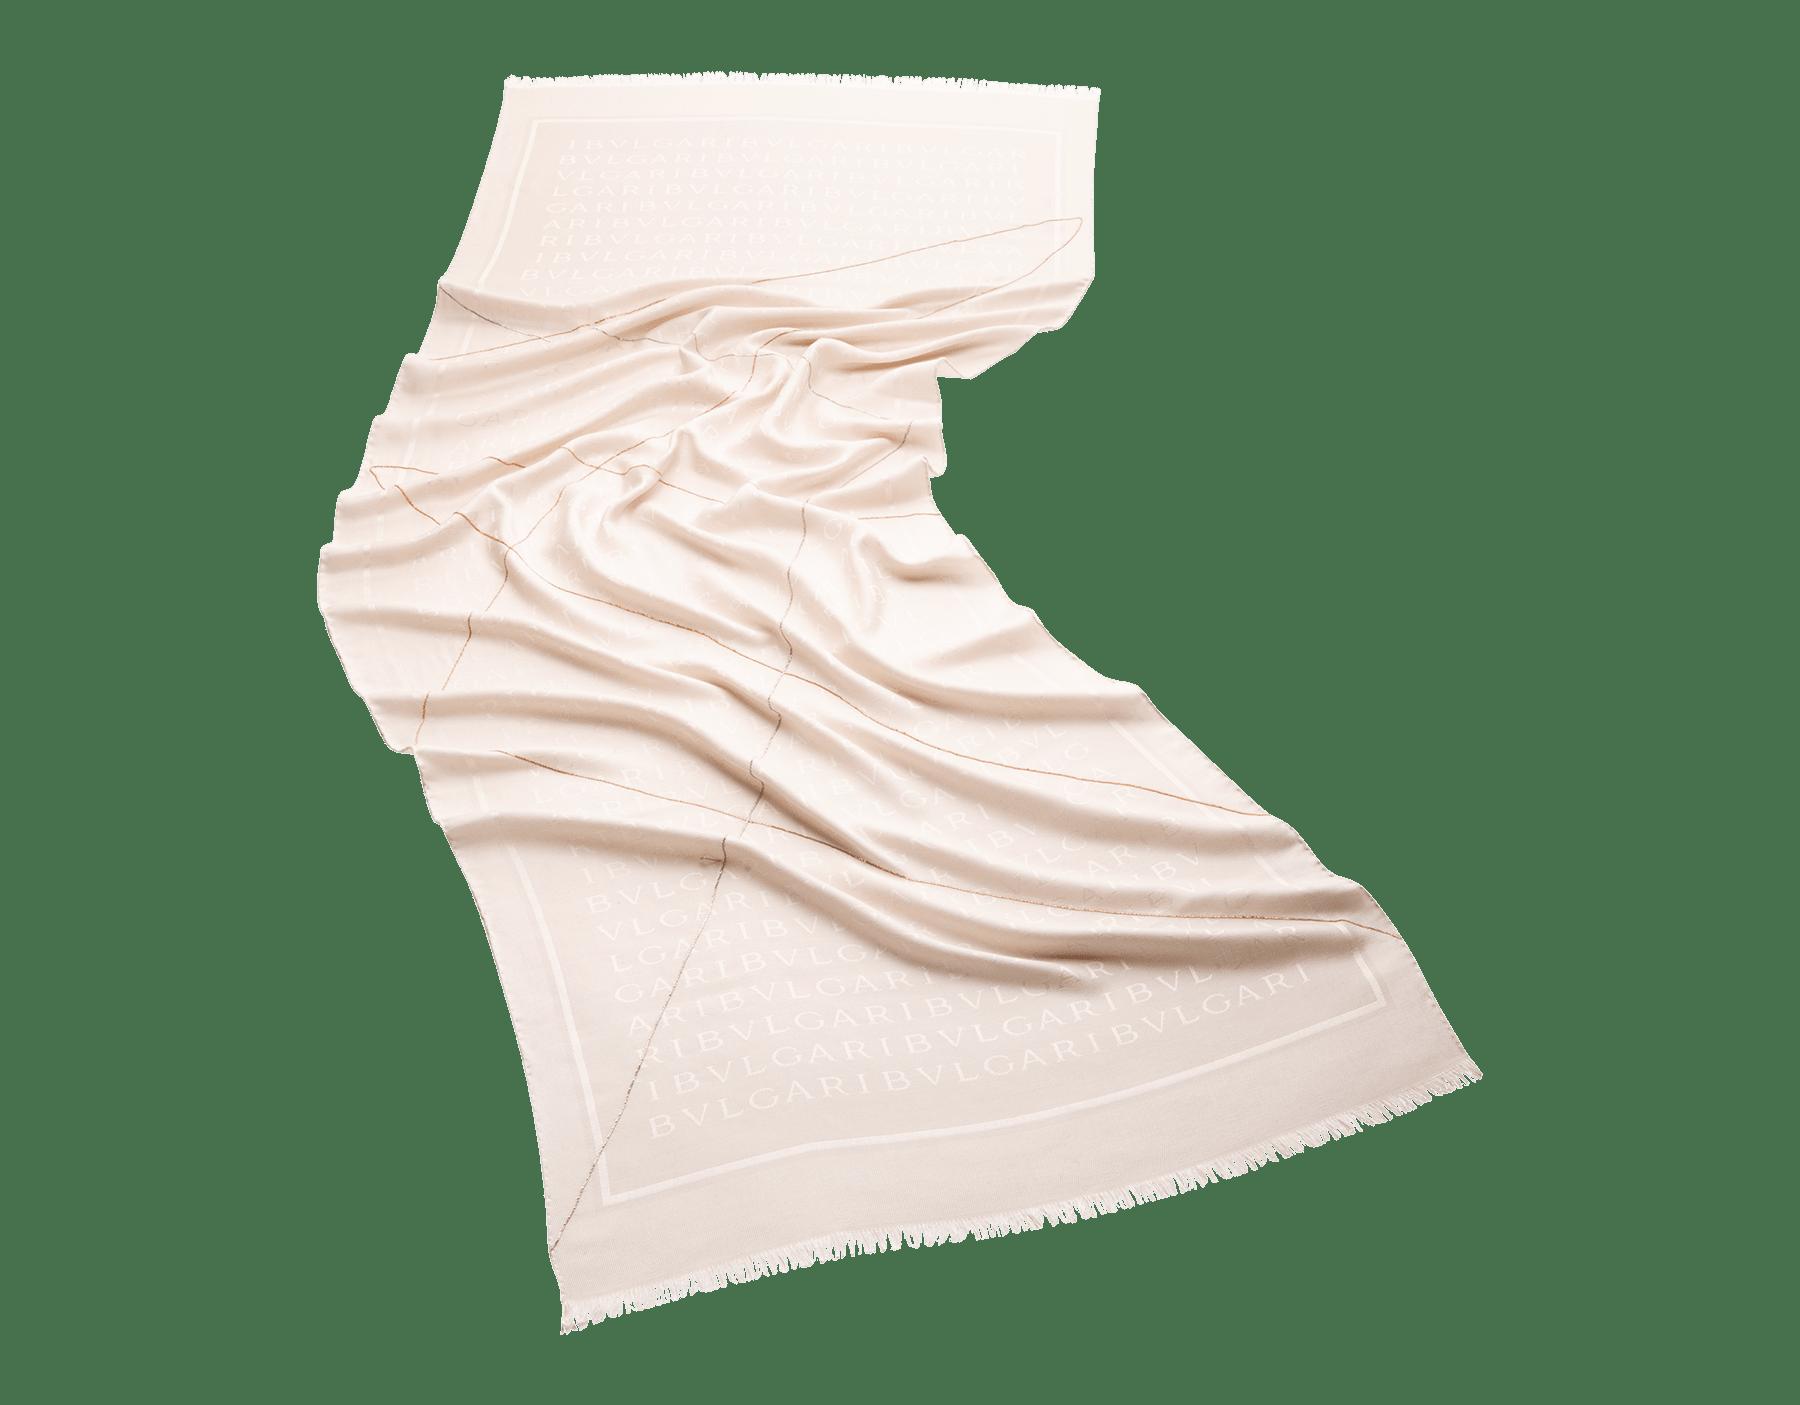 Палантин Lettere Chain цвета белого агата, тонкий шелк и шерсть. 243966 image 1